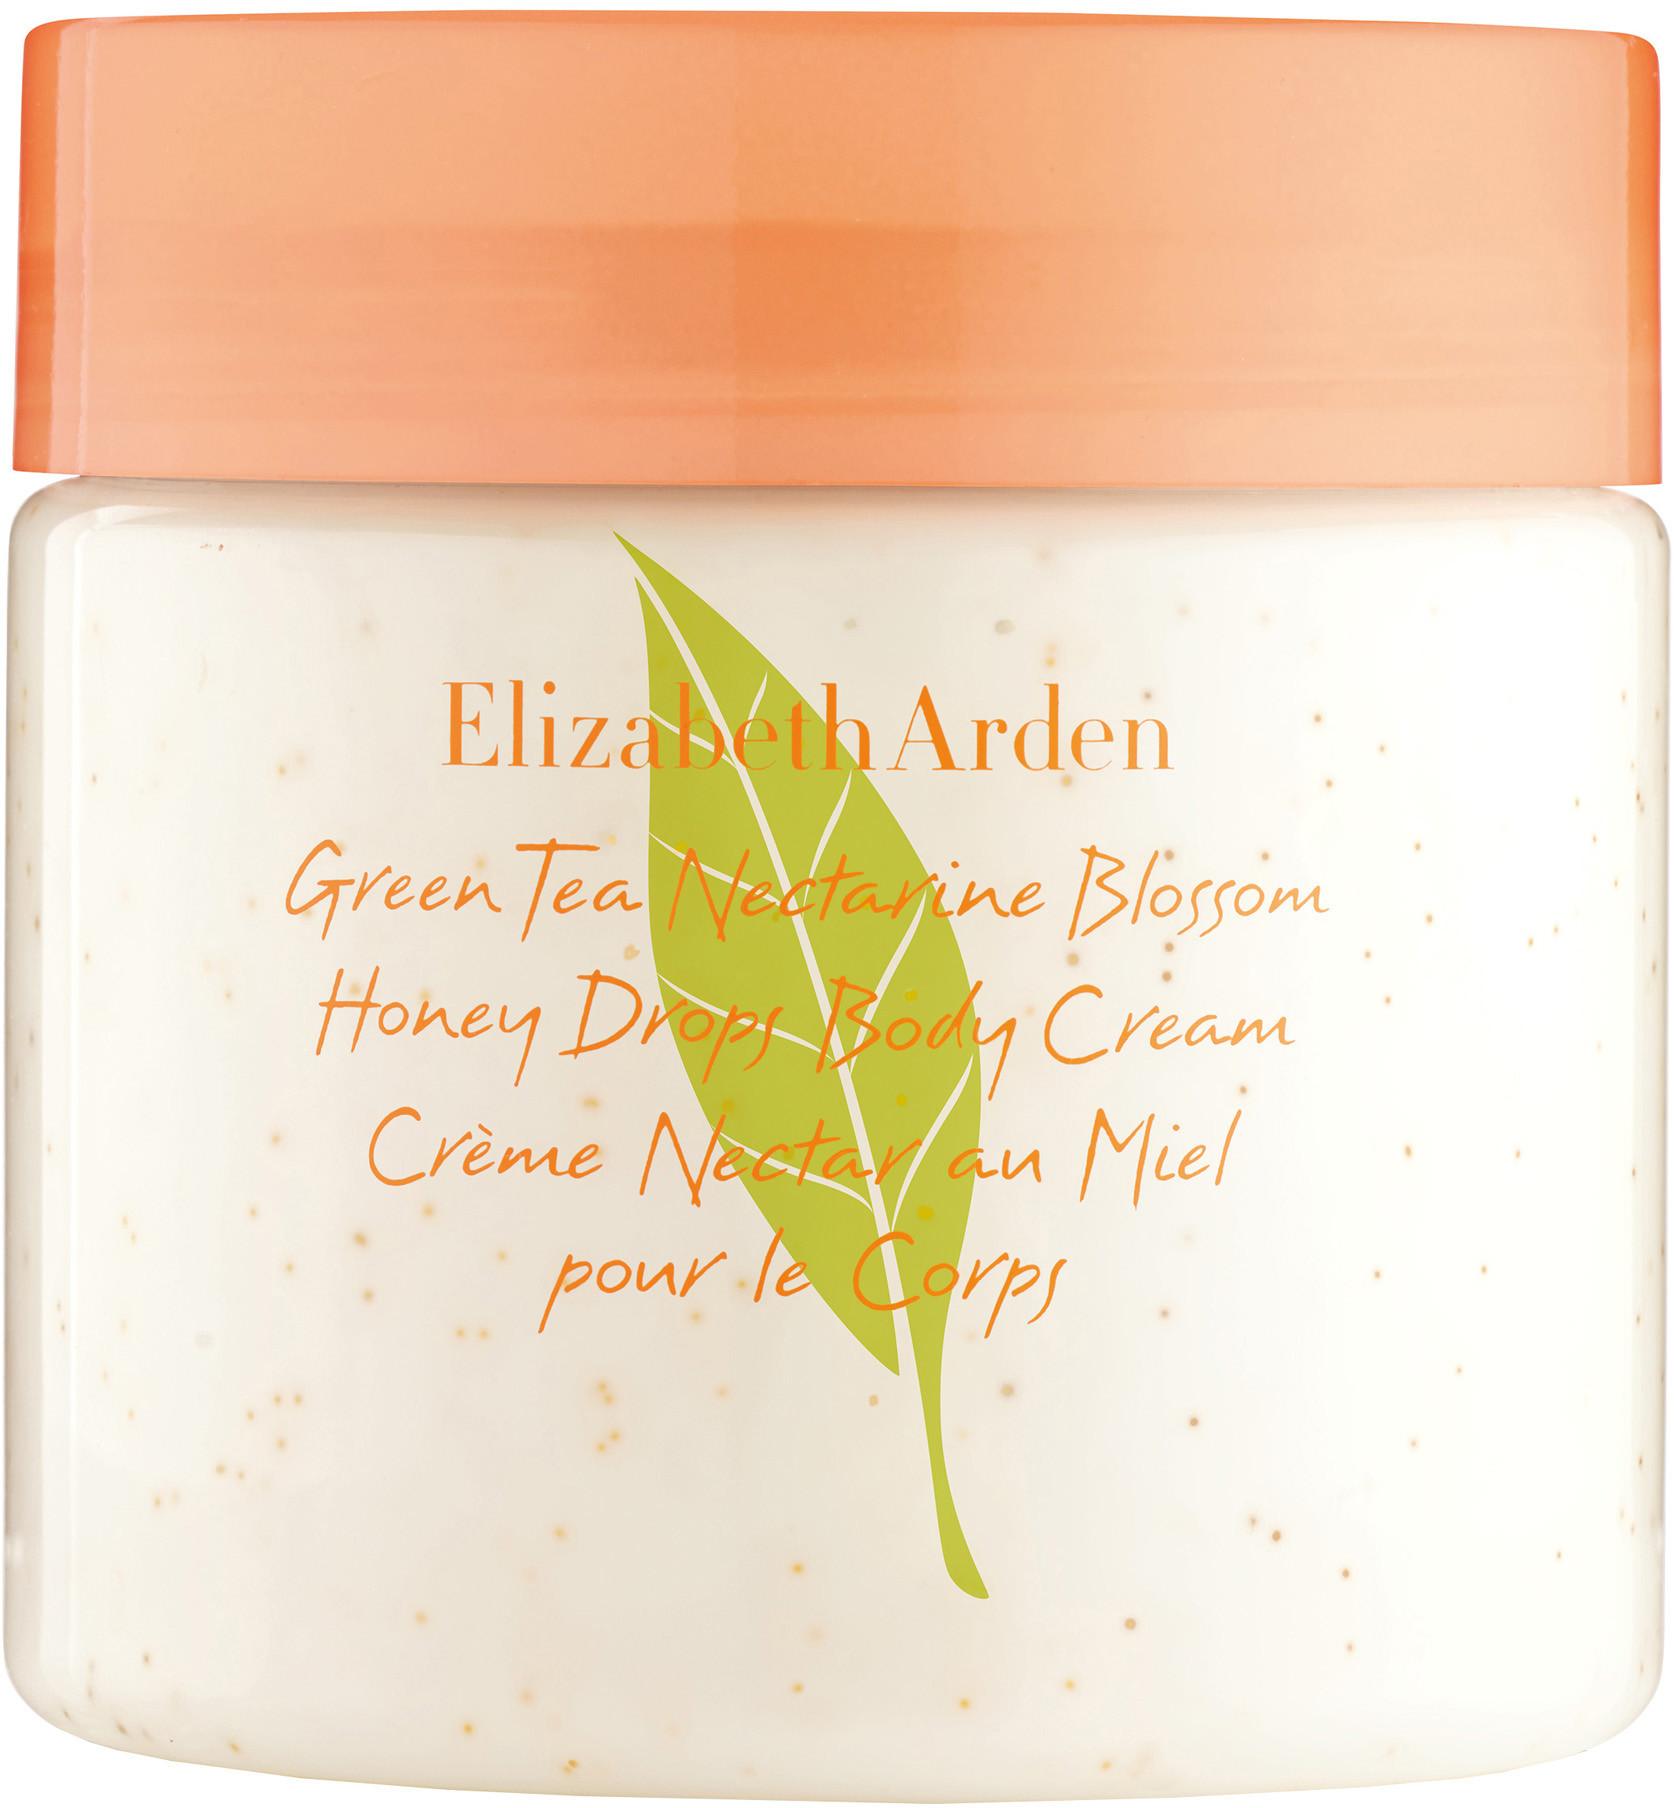 Elizabeth Arden kehakreem Nectarine Blossom 500ml